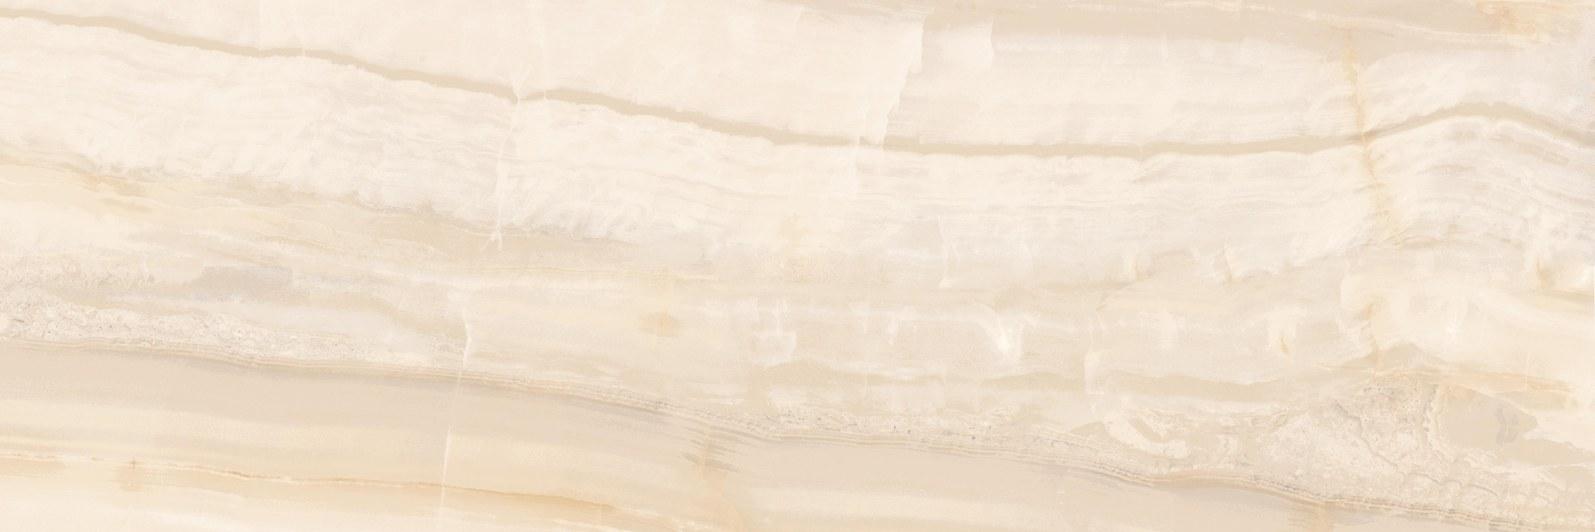 Onice Beige плитка настенная 250х750 мм/62,88 kerranova onice milky 60x60